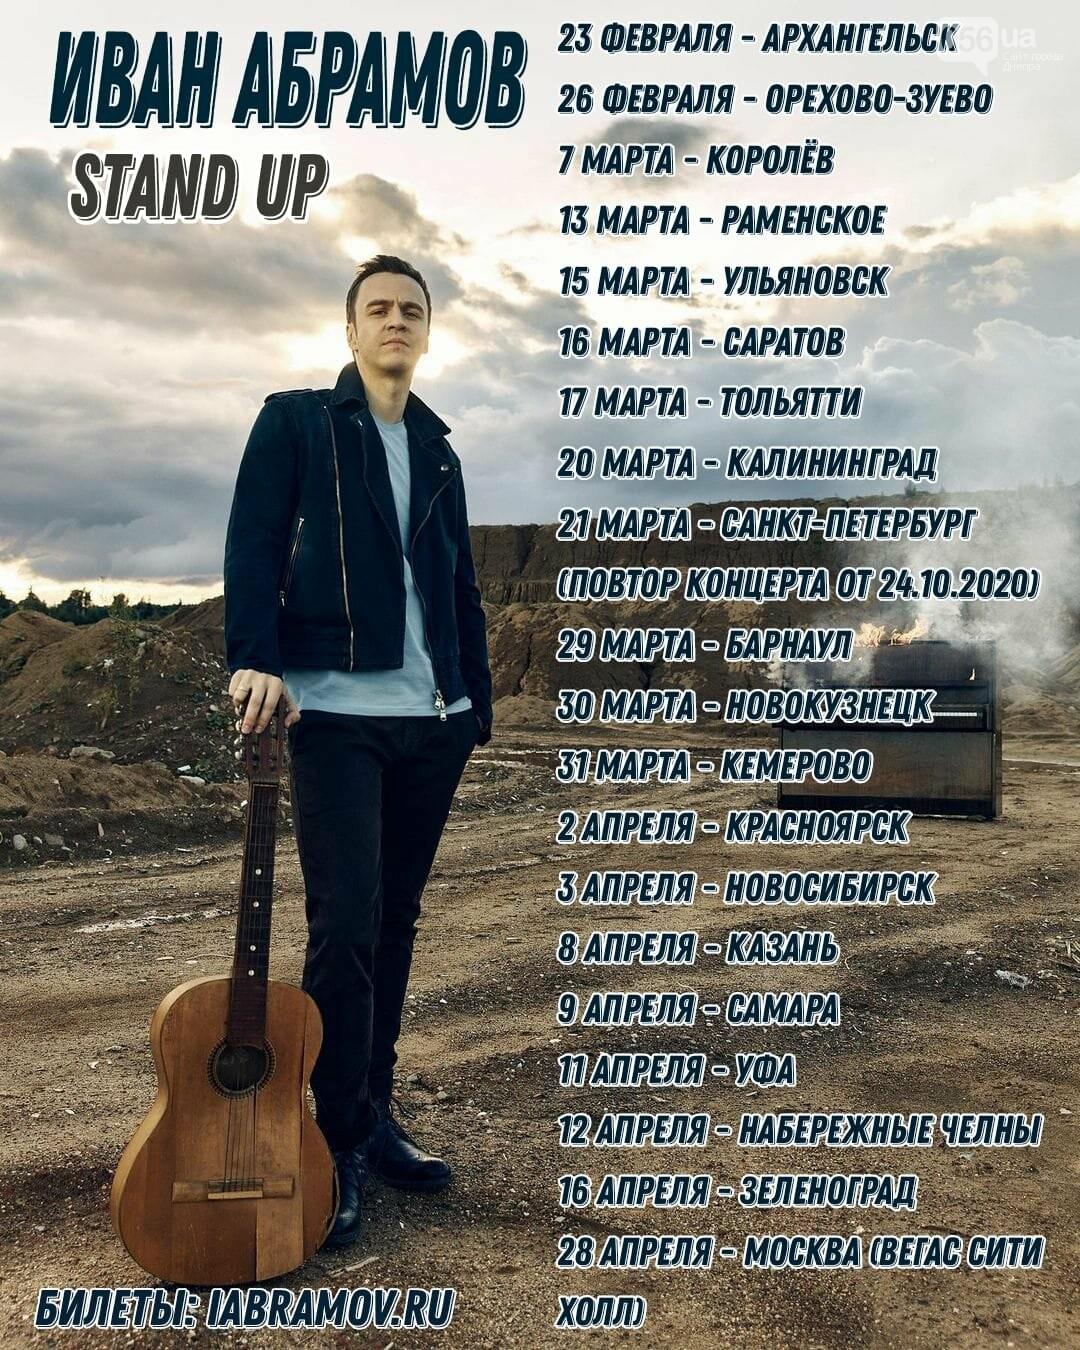 В Днепре остановили продажу билетов на концерт российского комика Ивана Абрамова, фото-1